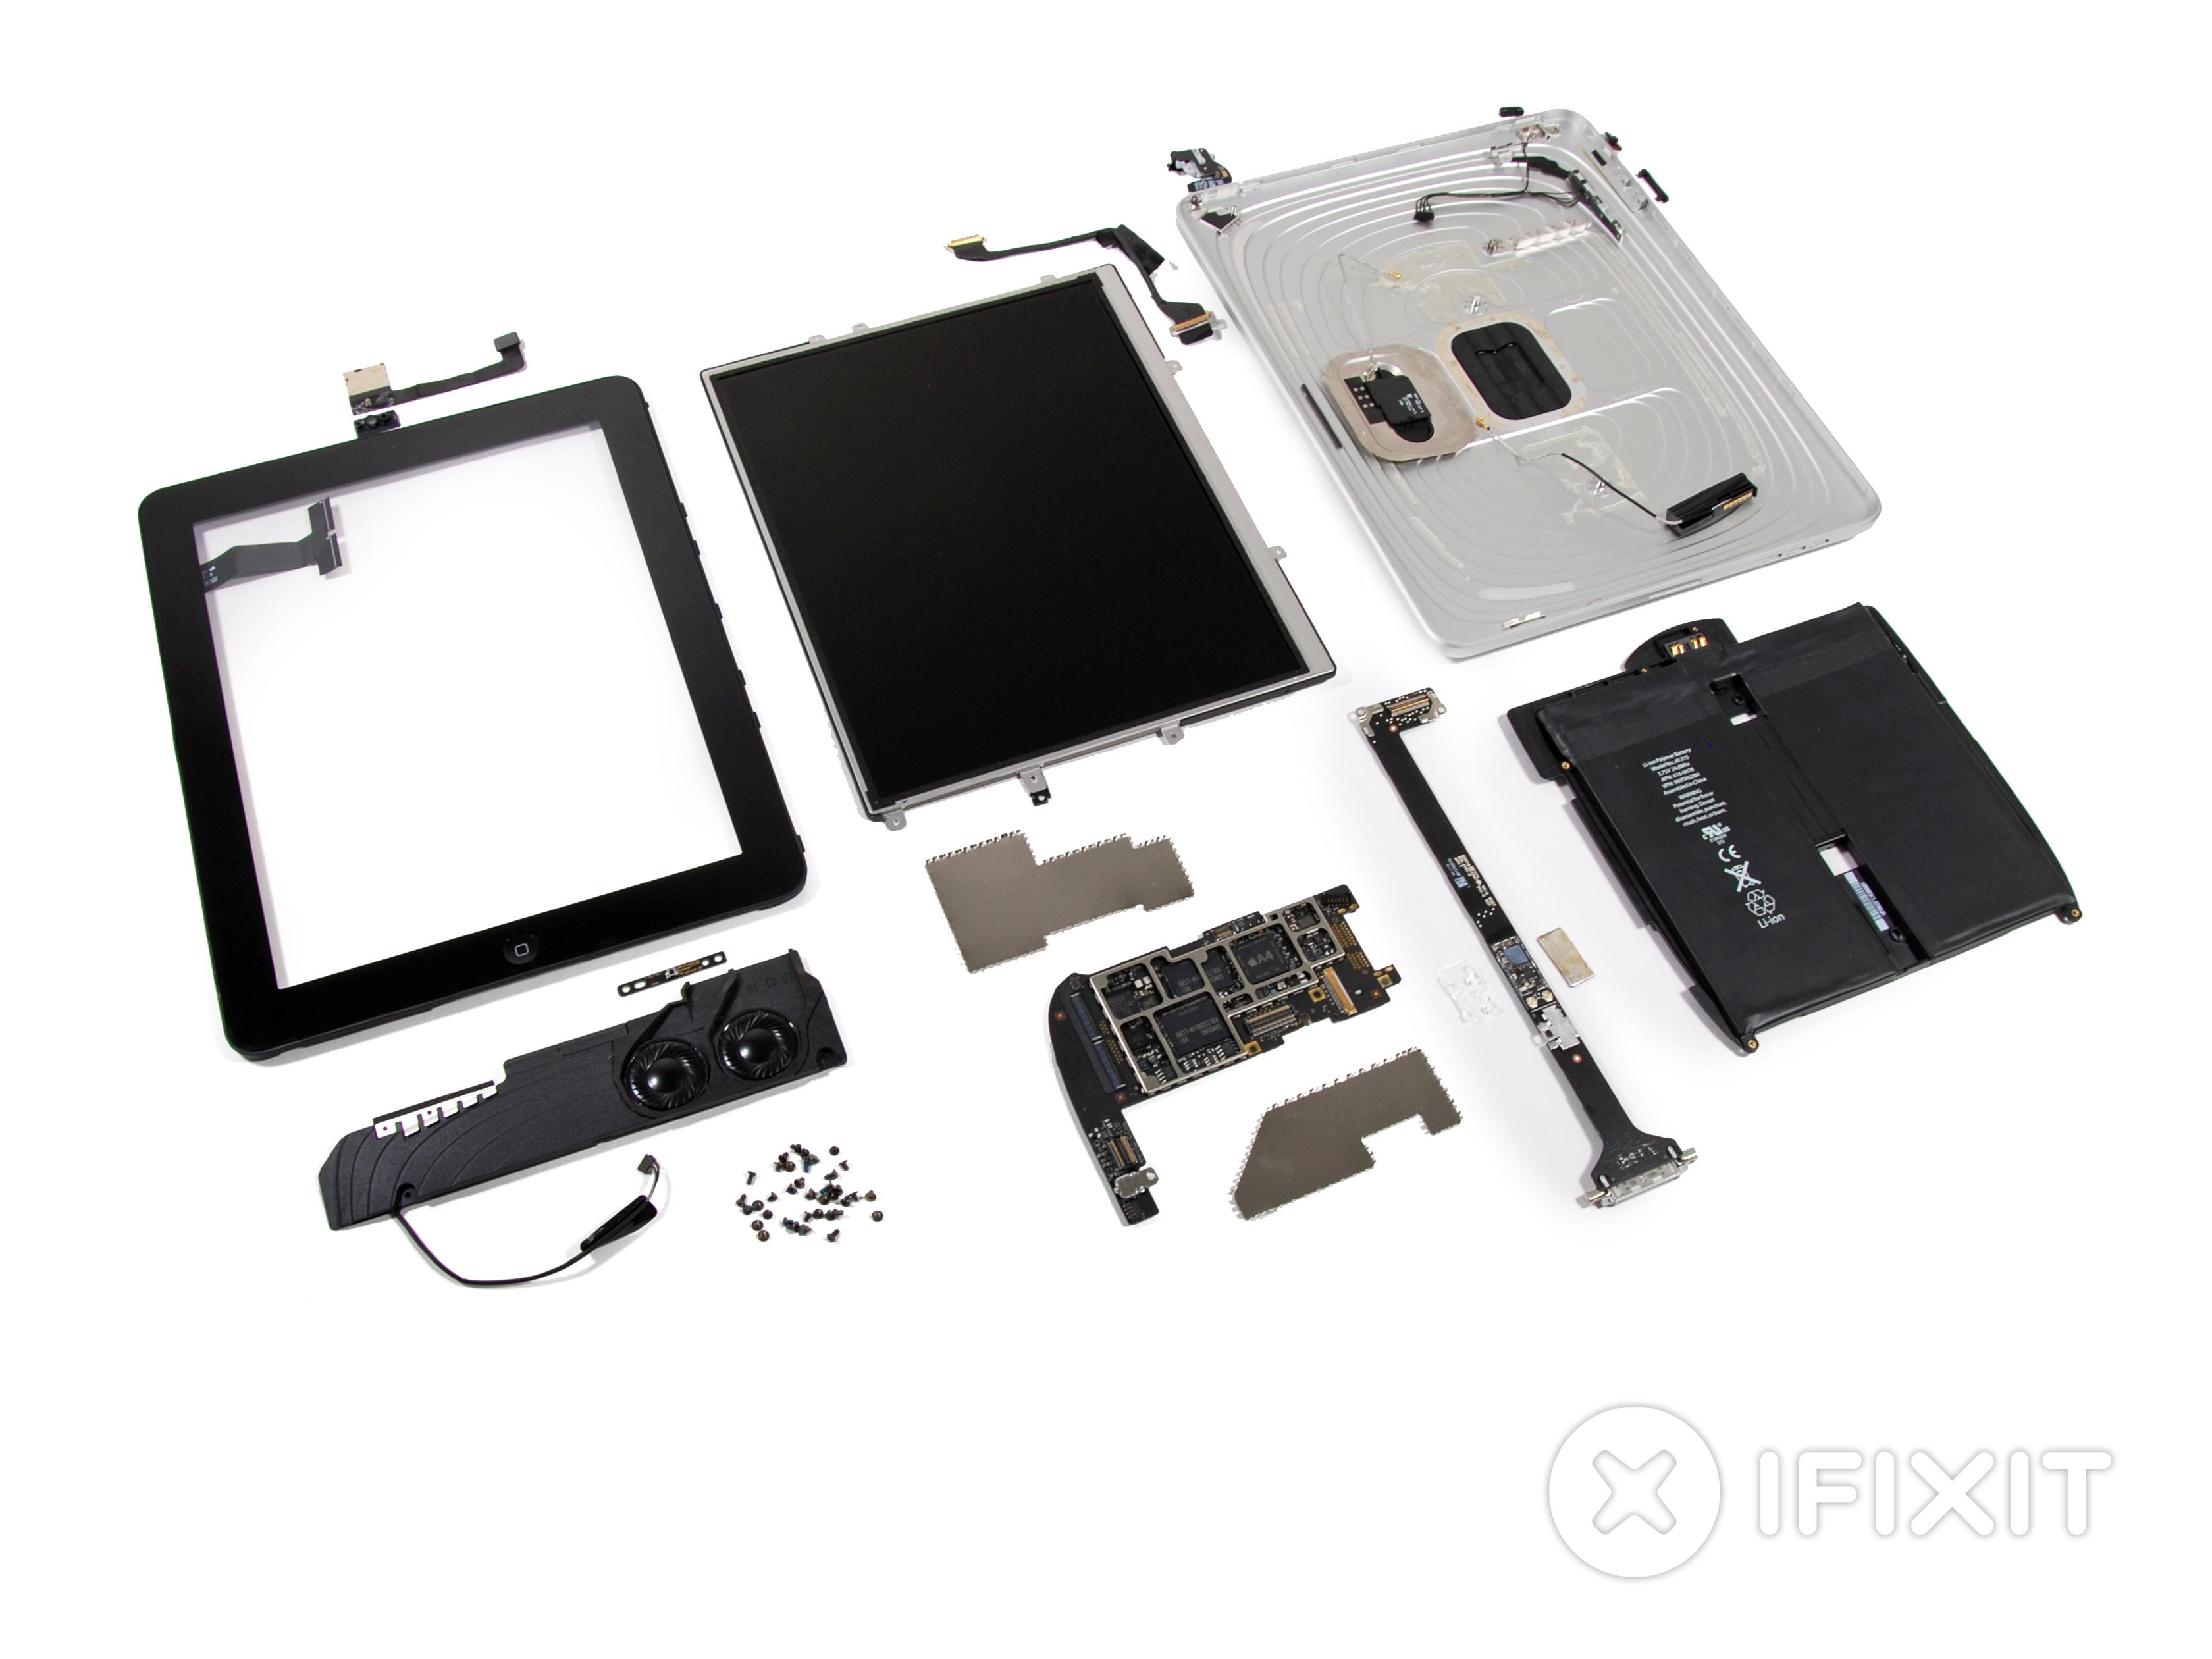 Ipad Wi Fi Teardown Ifixit Tool Tip Repair A Circuit Board Skool